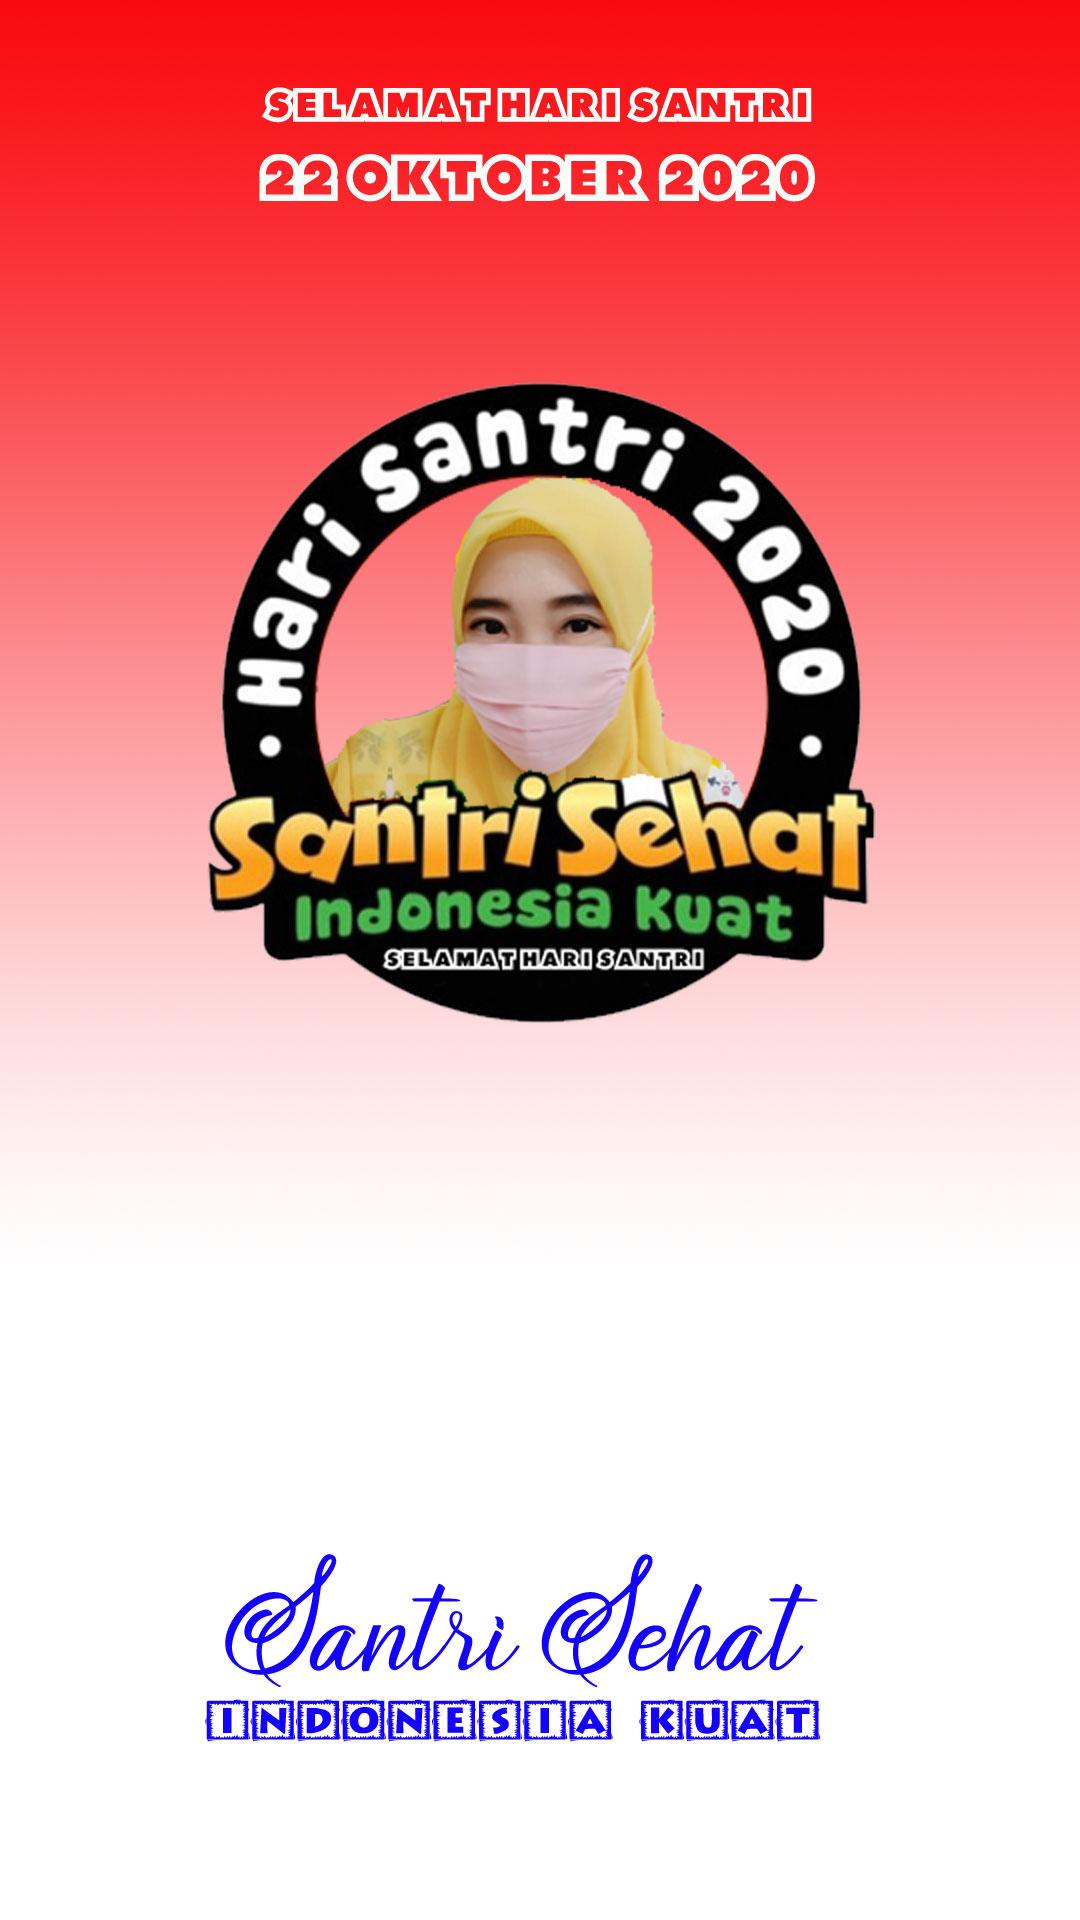 santri-sehat-indonesia-kuat